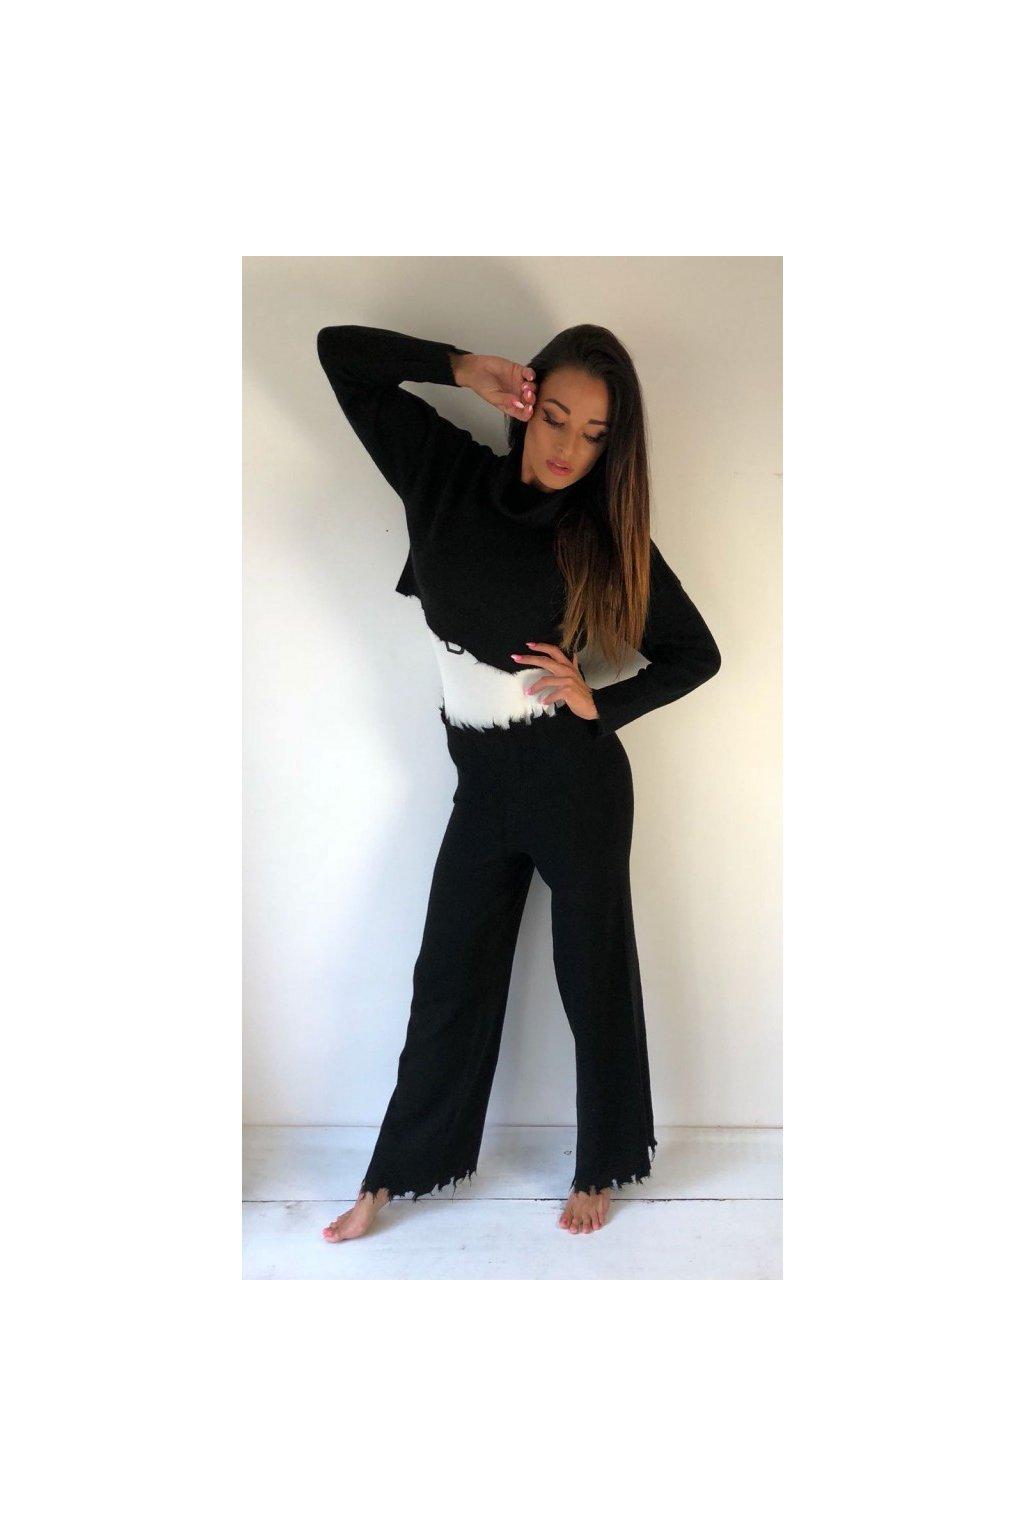 Kalhoty z pleteniny Kostumn1 - černé (Velikost Velikost L)